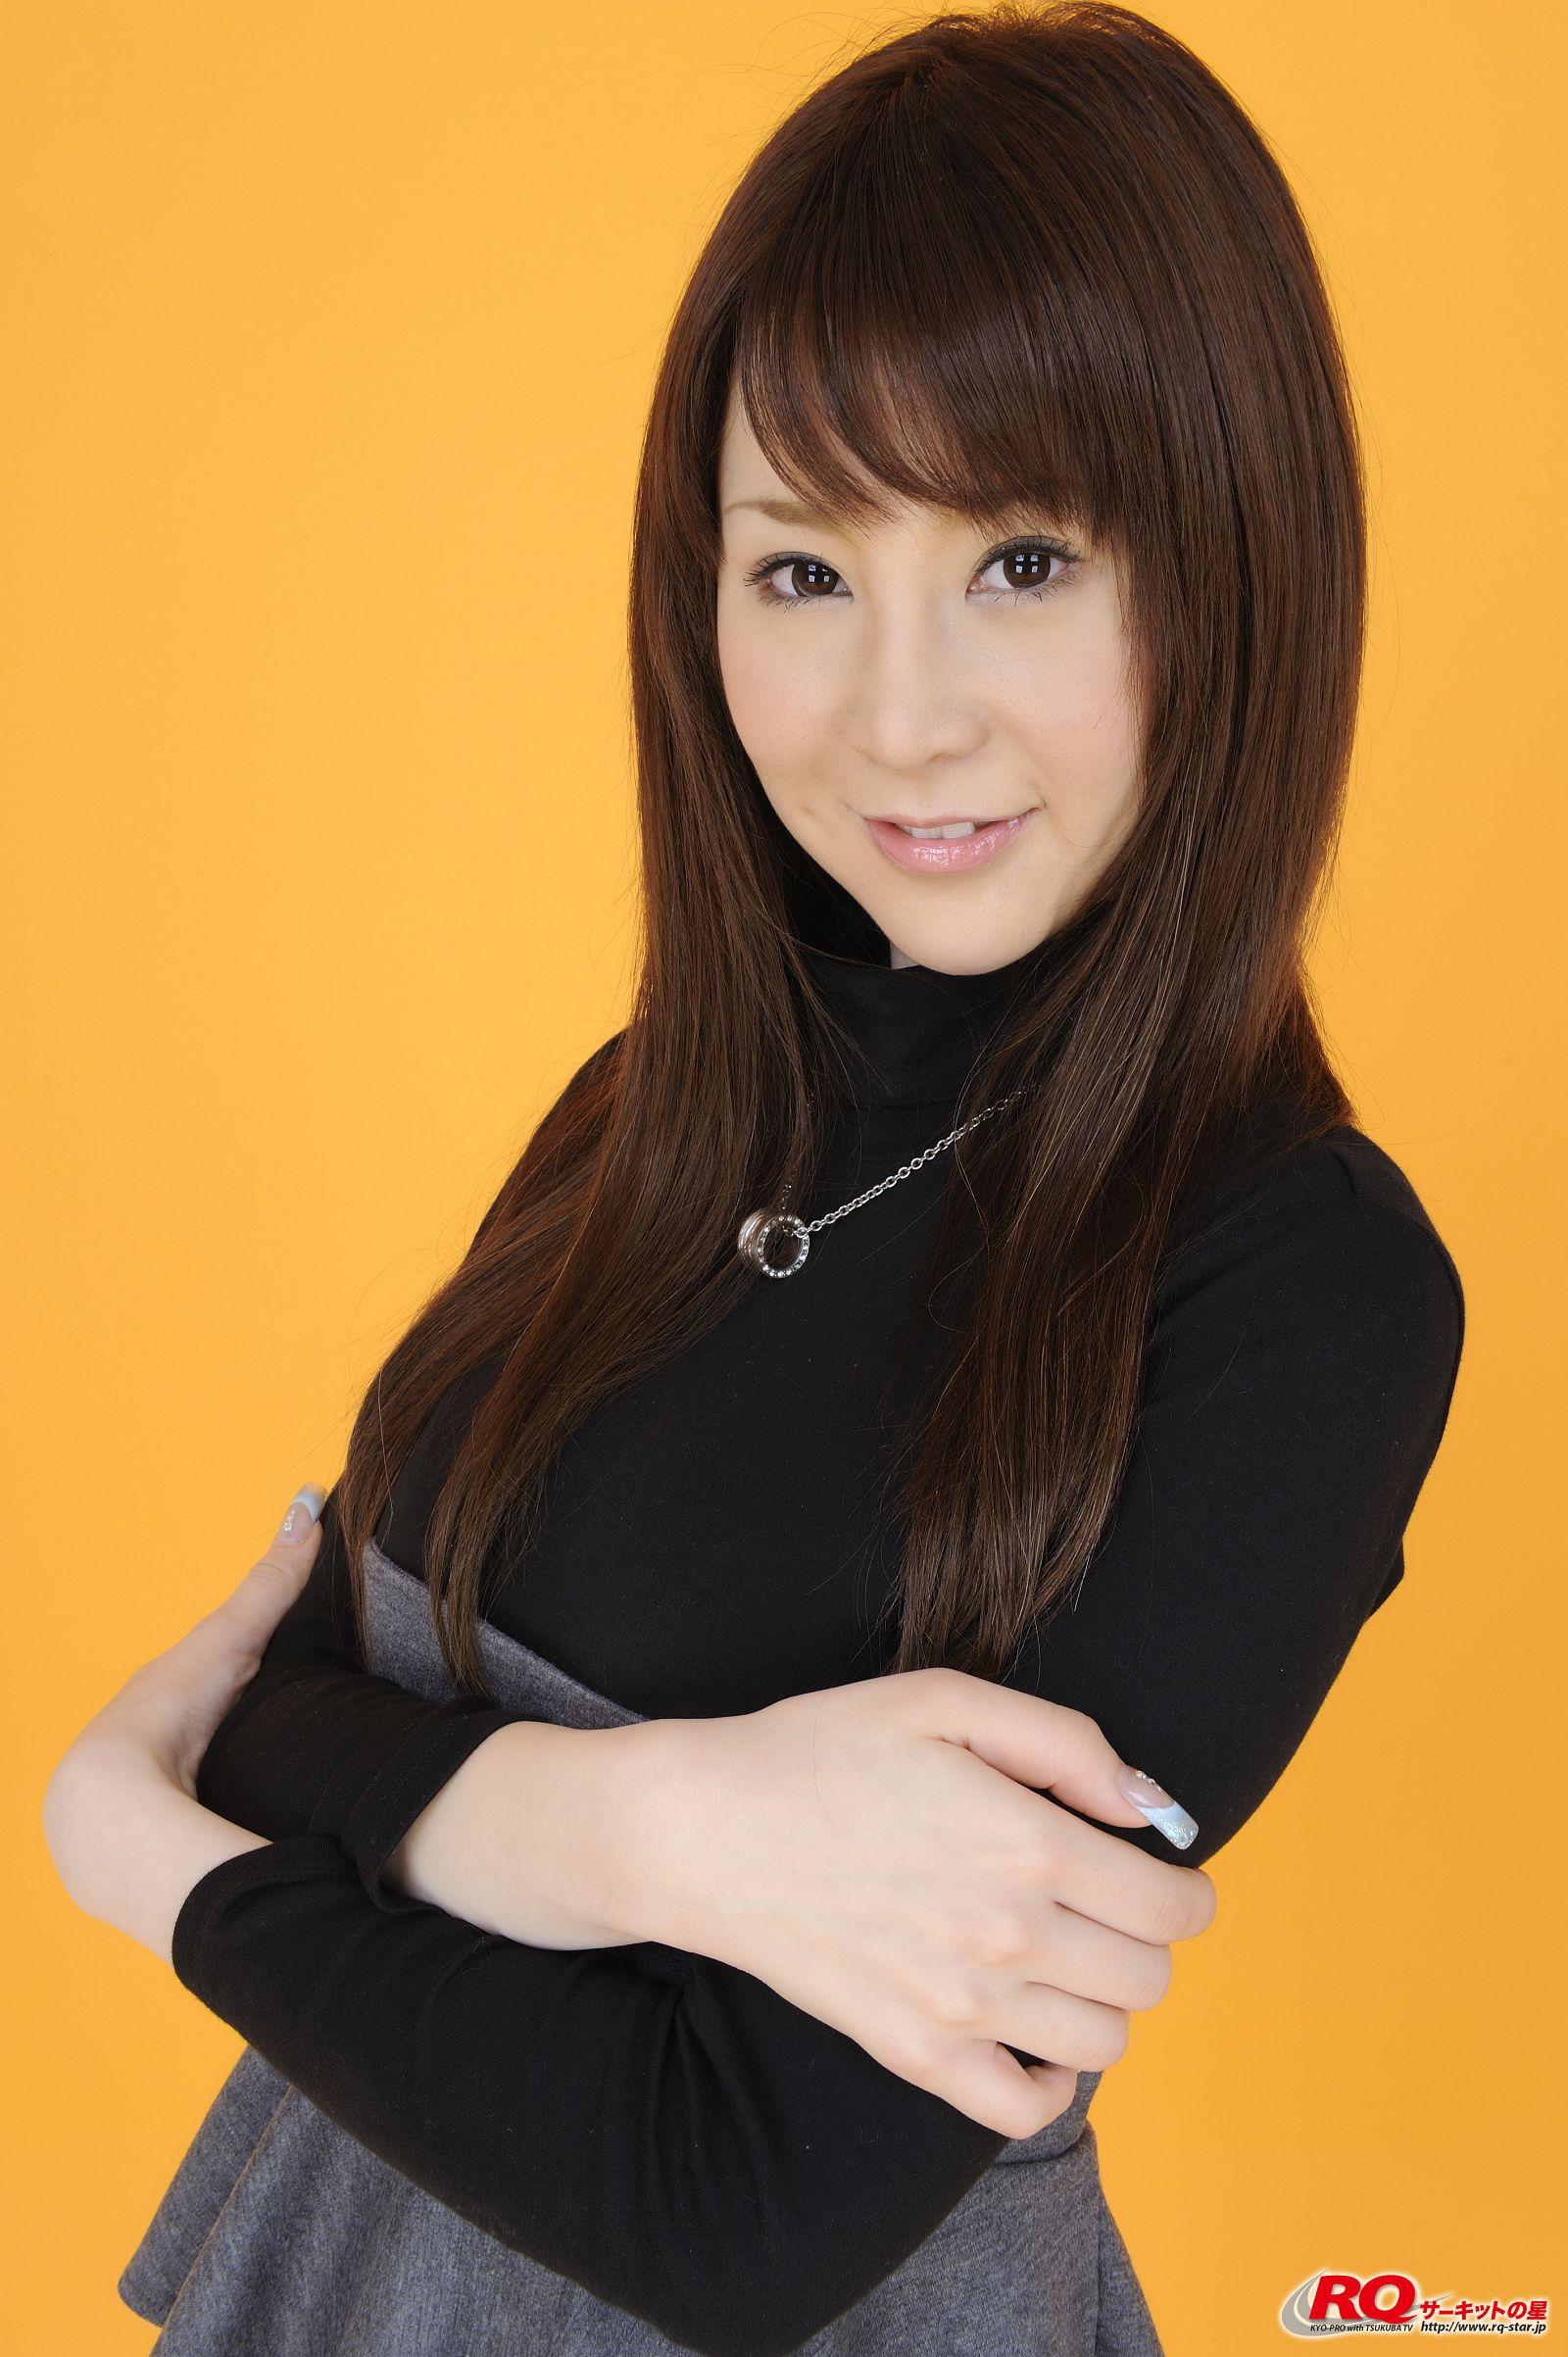 [RQ STAR美女] NO.00122 Yuko Nakamura 中村优子 Private Dress[81P] RQ STAR 第2张